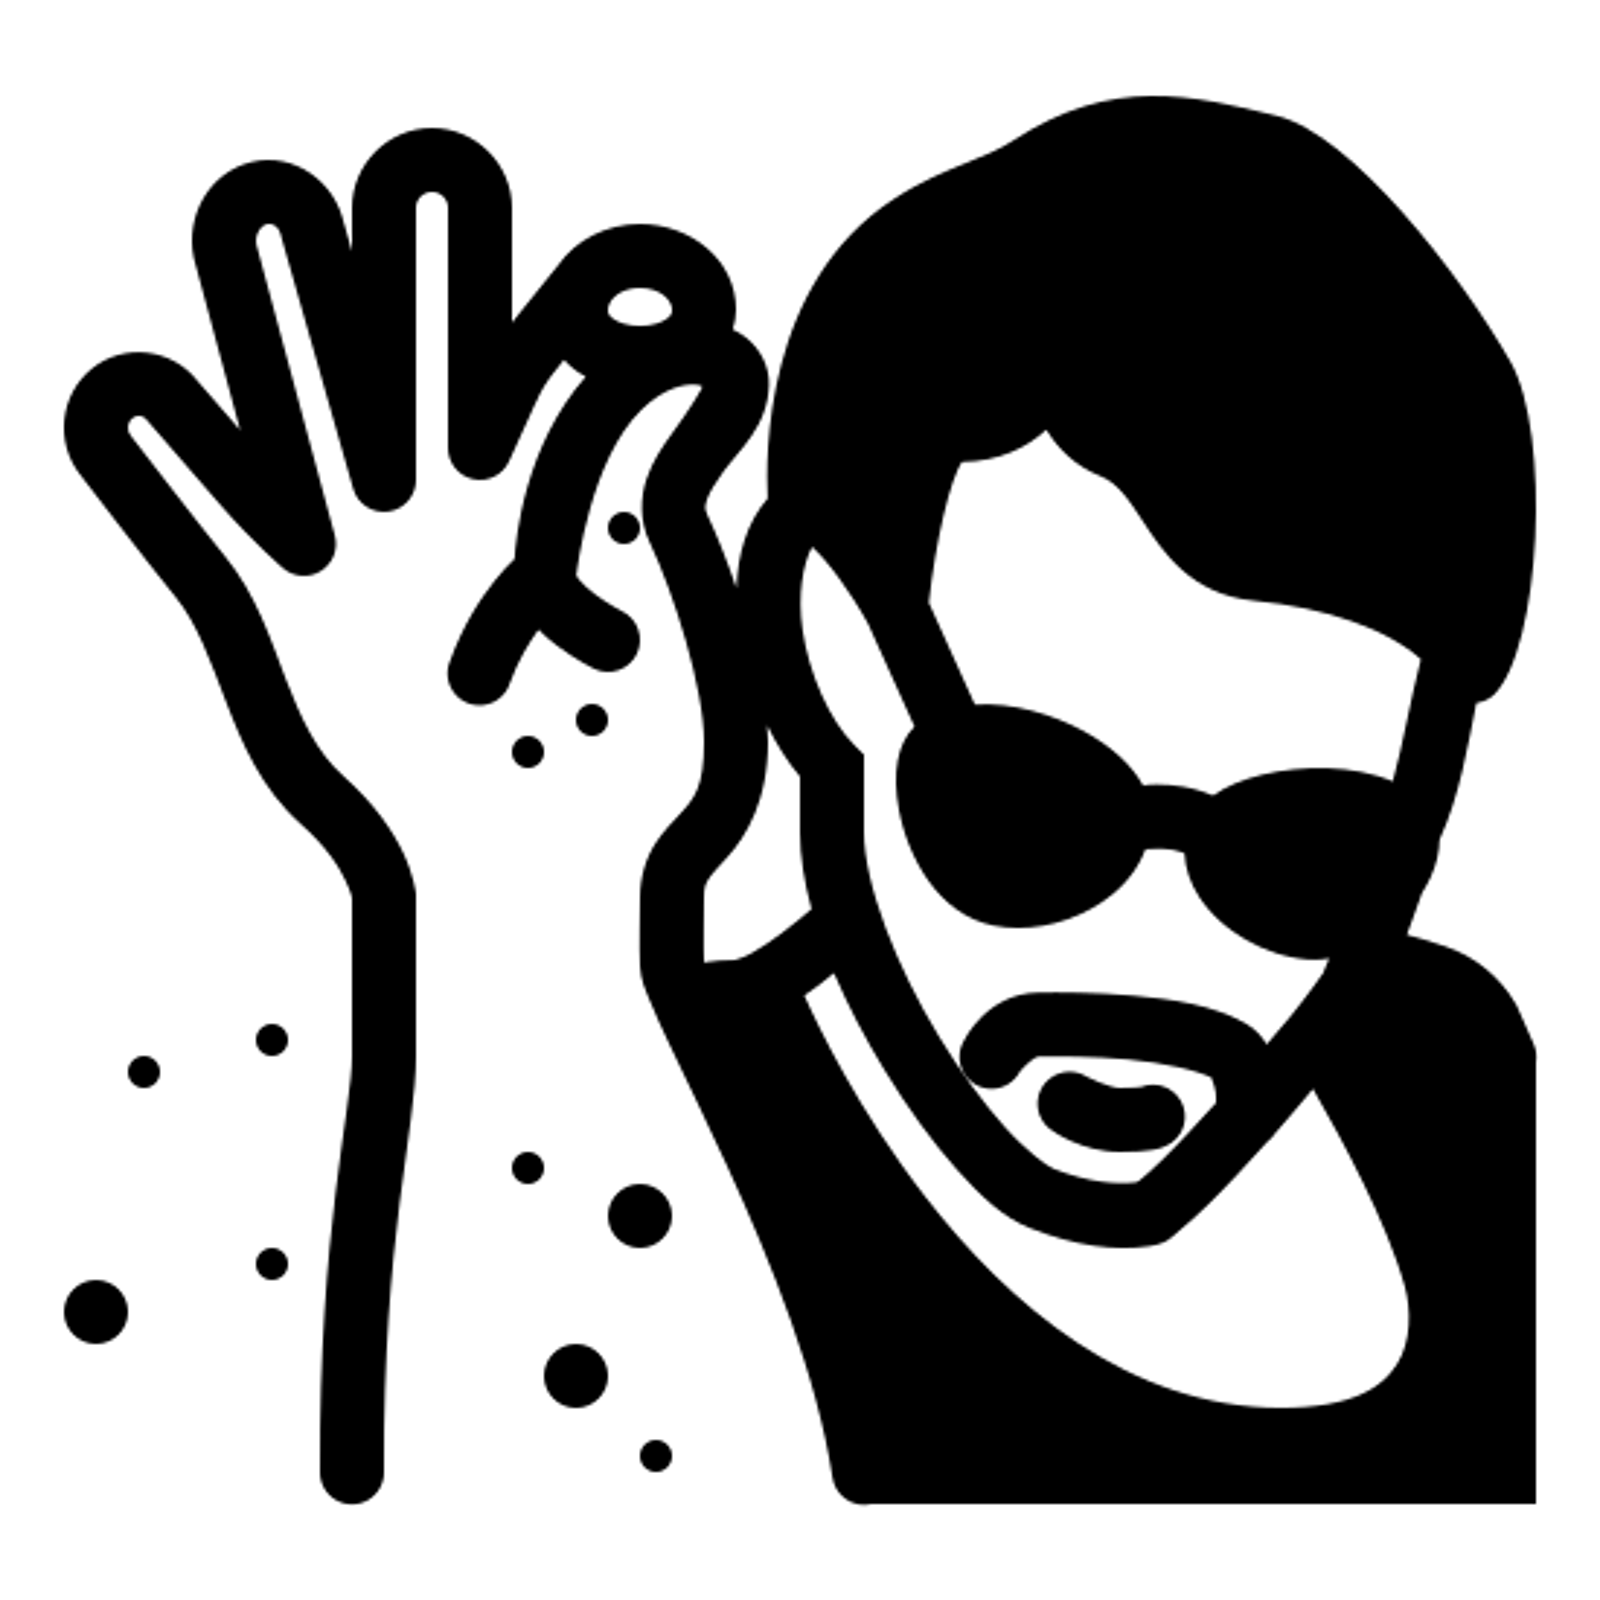 Salt Bae Filled icon